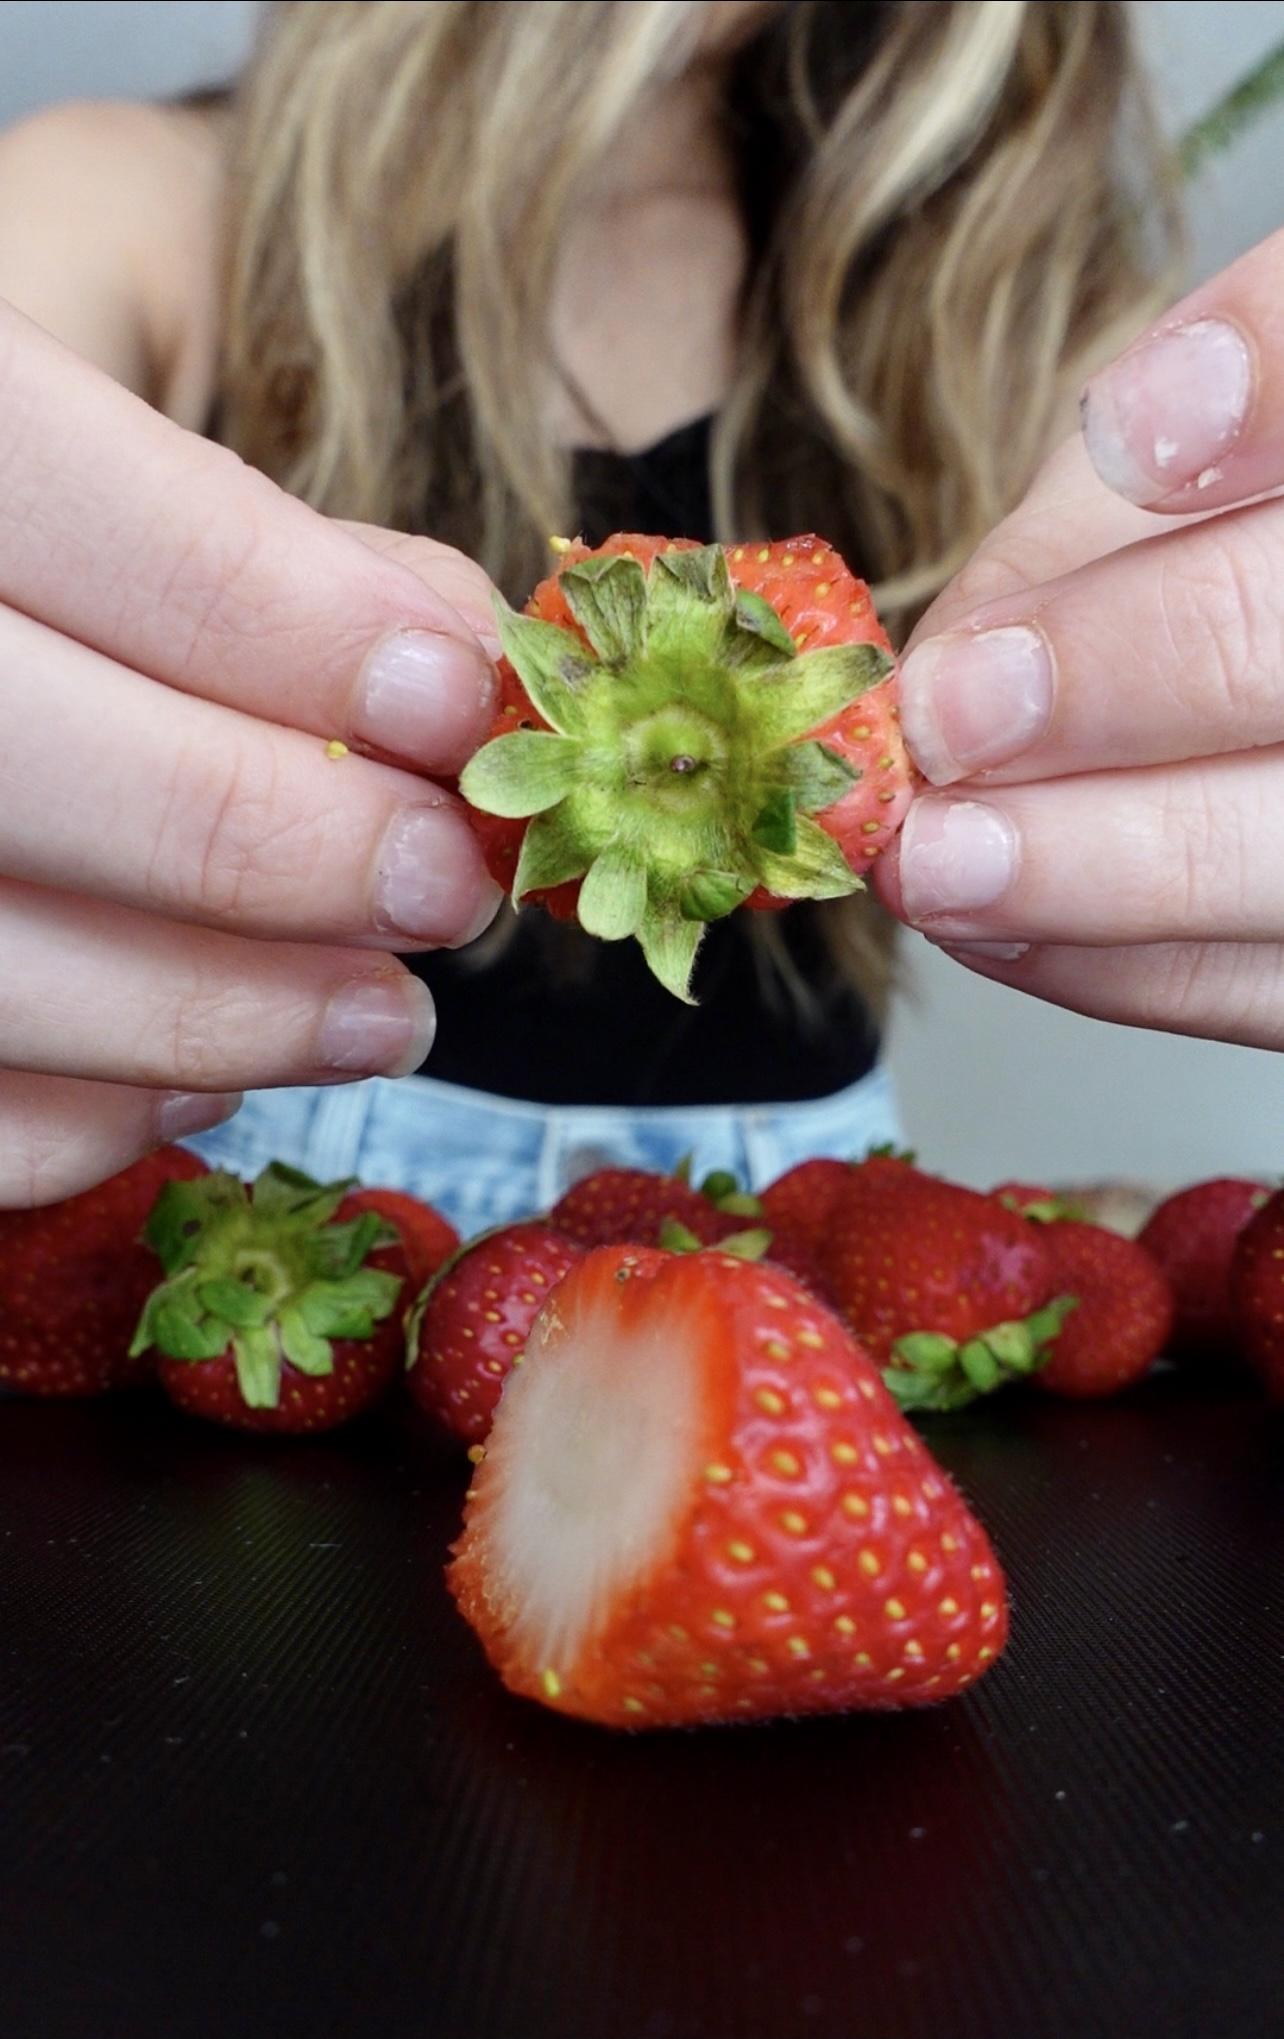 Strawberry Top Vinegar